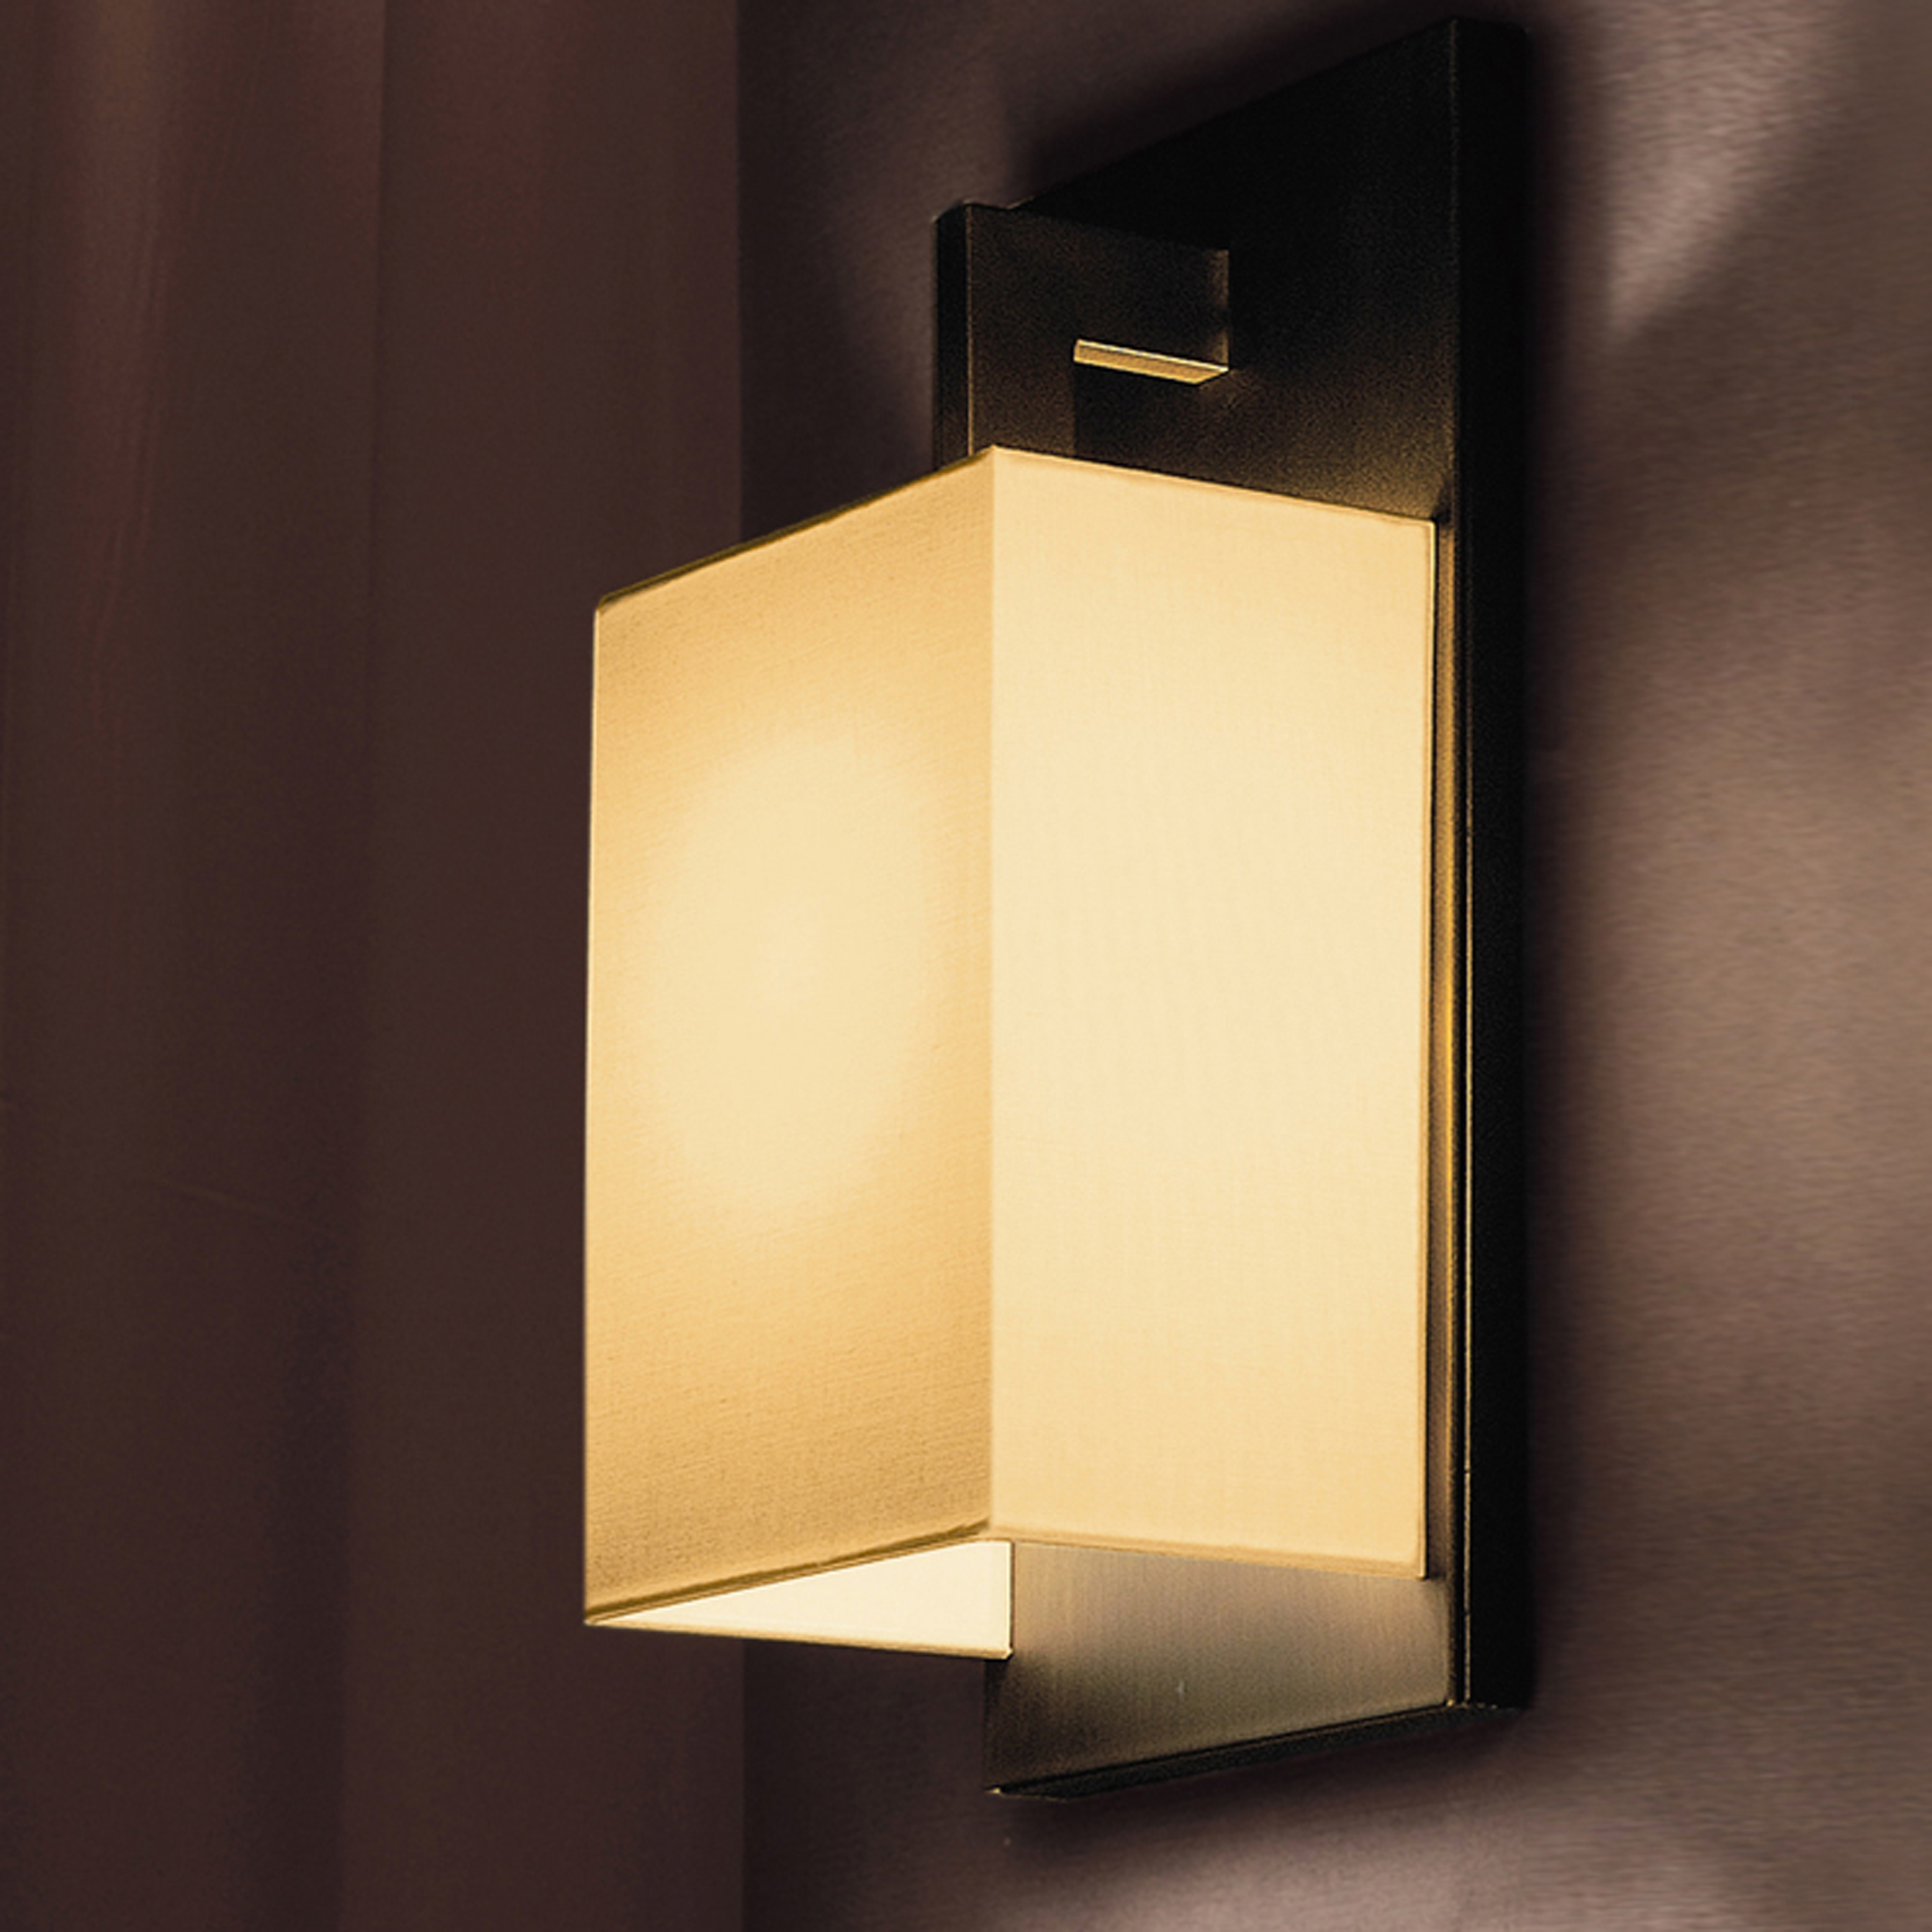 Contardi Coconette Ap Wall Light Satin Bronze White Linen B